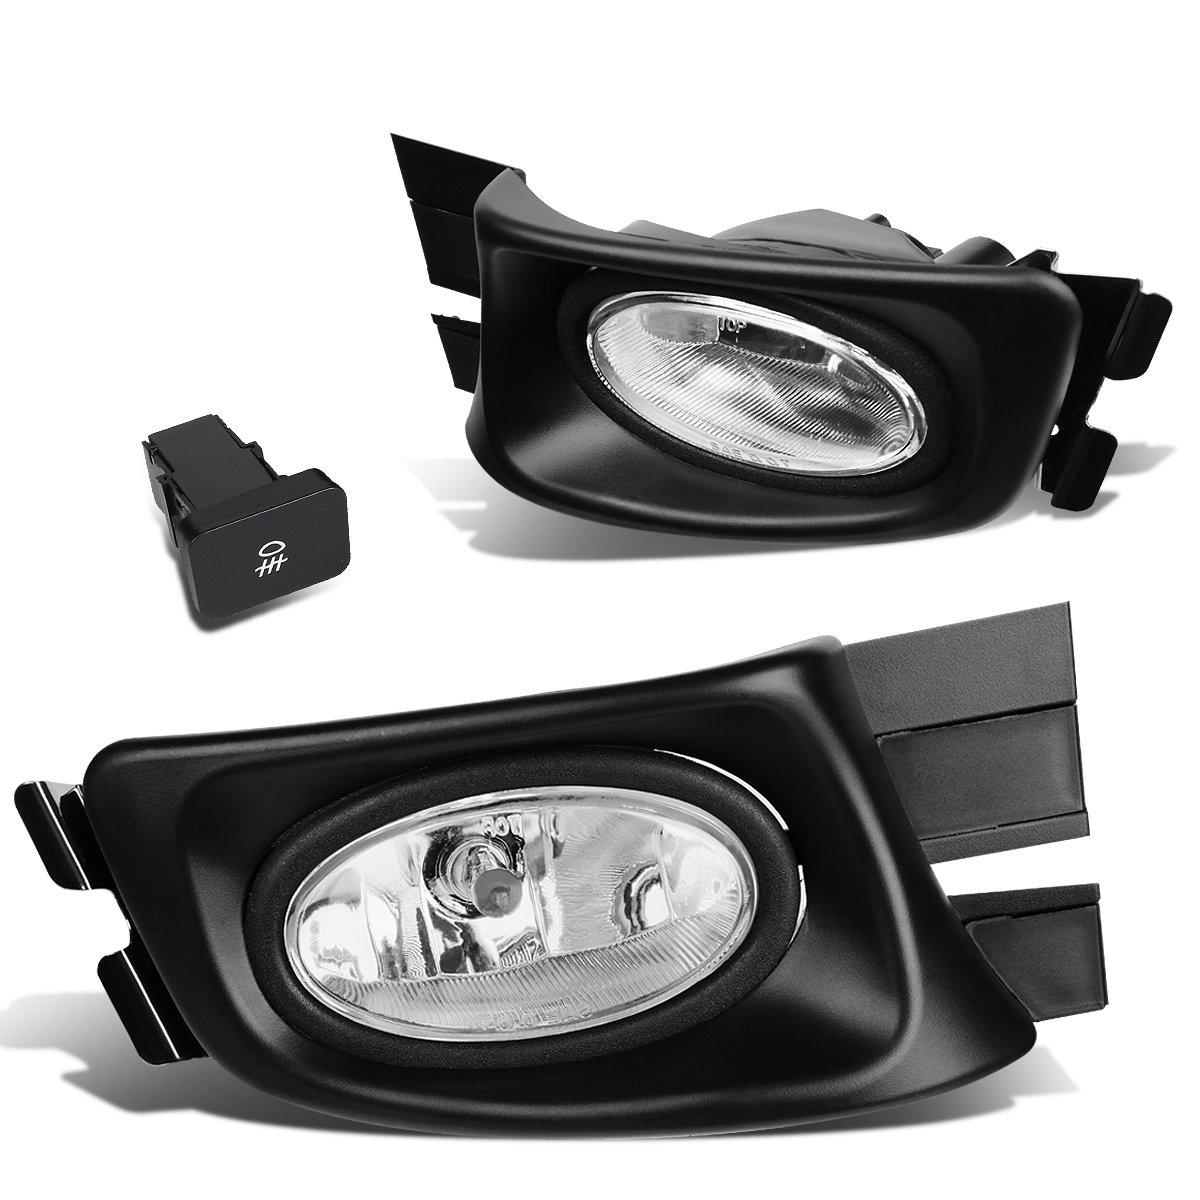 H11 Bulb Fog Light car lights Black For Honda Accord Acura TL JDM 4 Drs 03-07